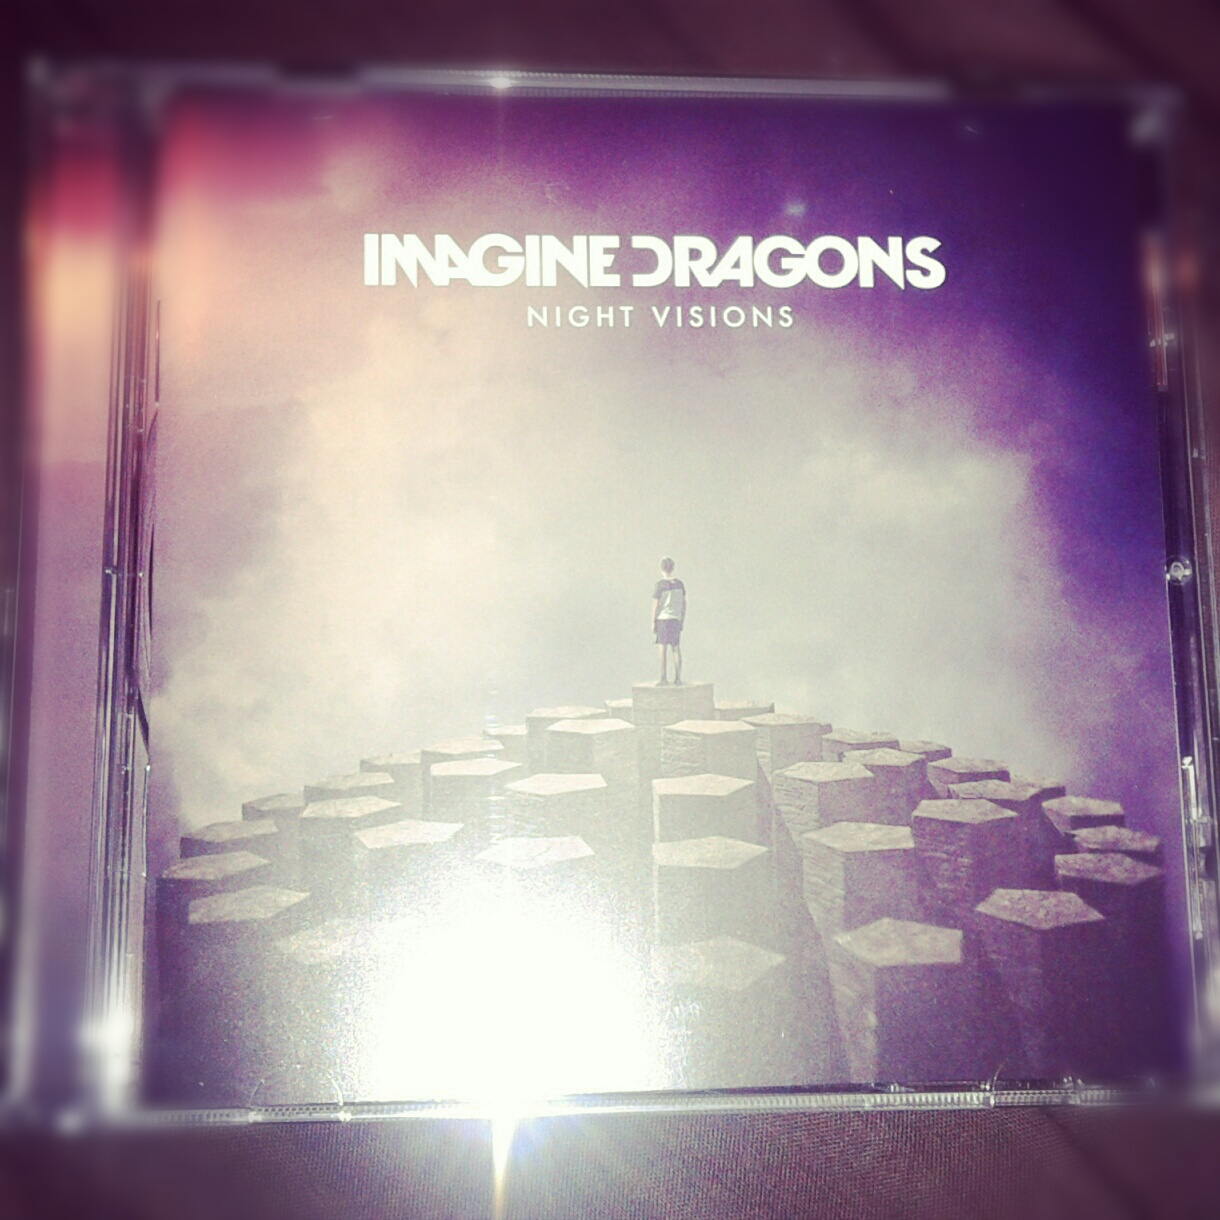 Download Next To Me Imagine Dragon Wapka: My Movie Soundtrack...: Imagine Dragons